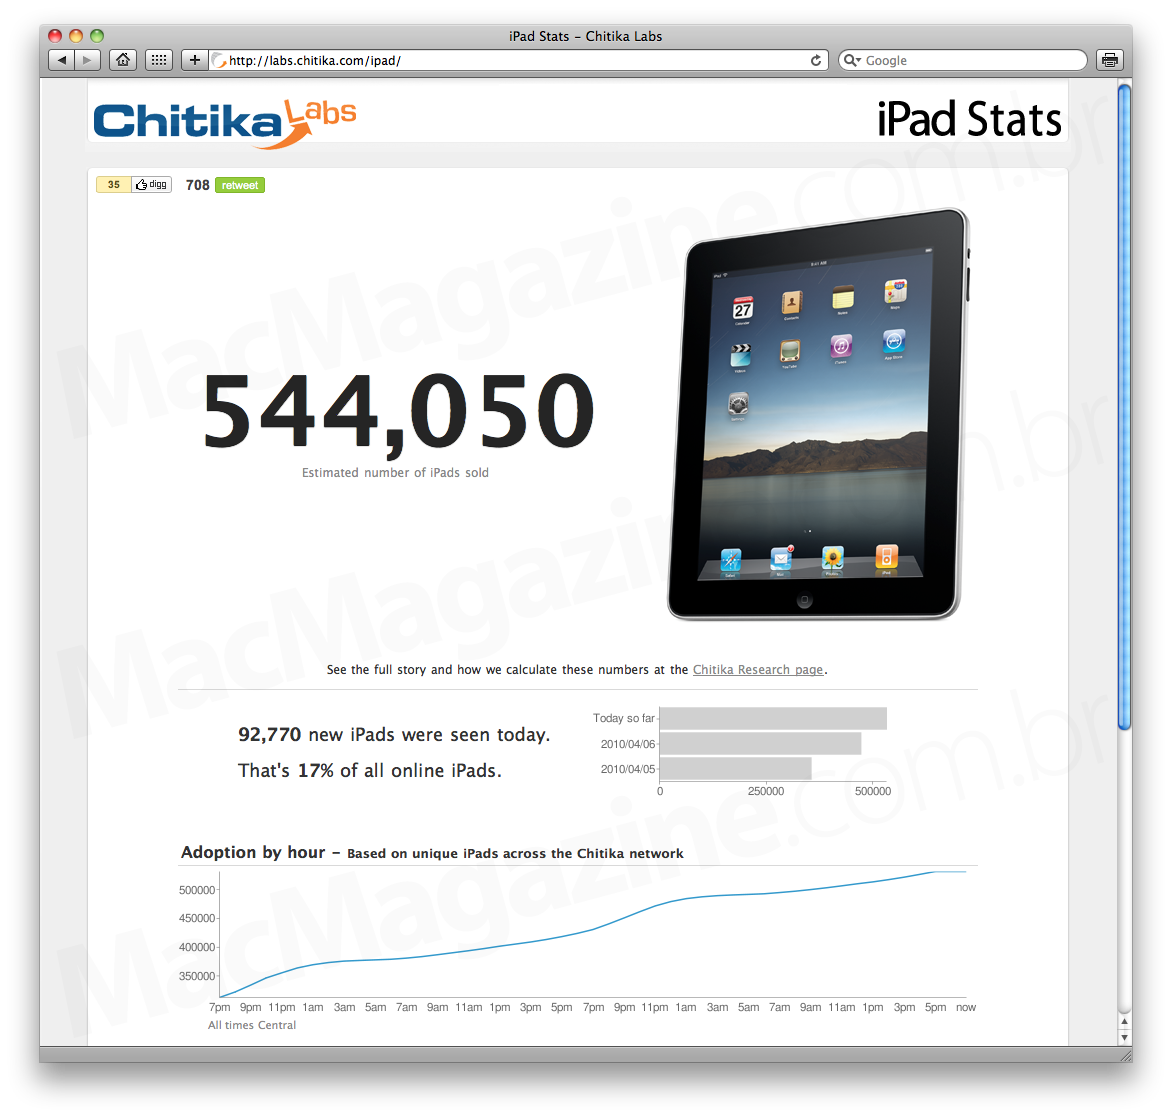 iPads vendidos, by Chitika Labs